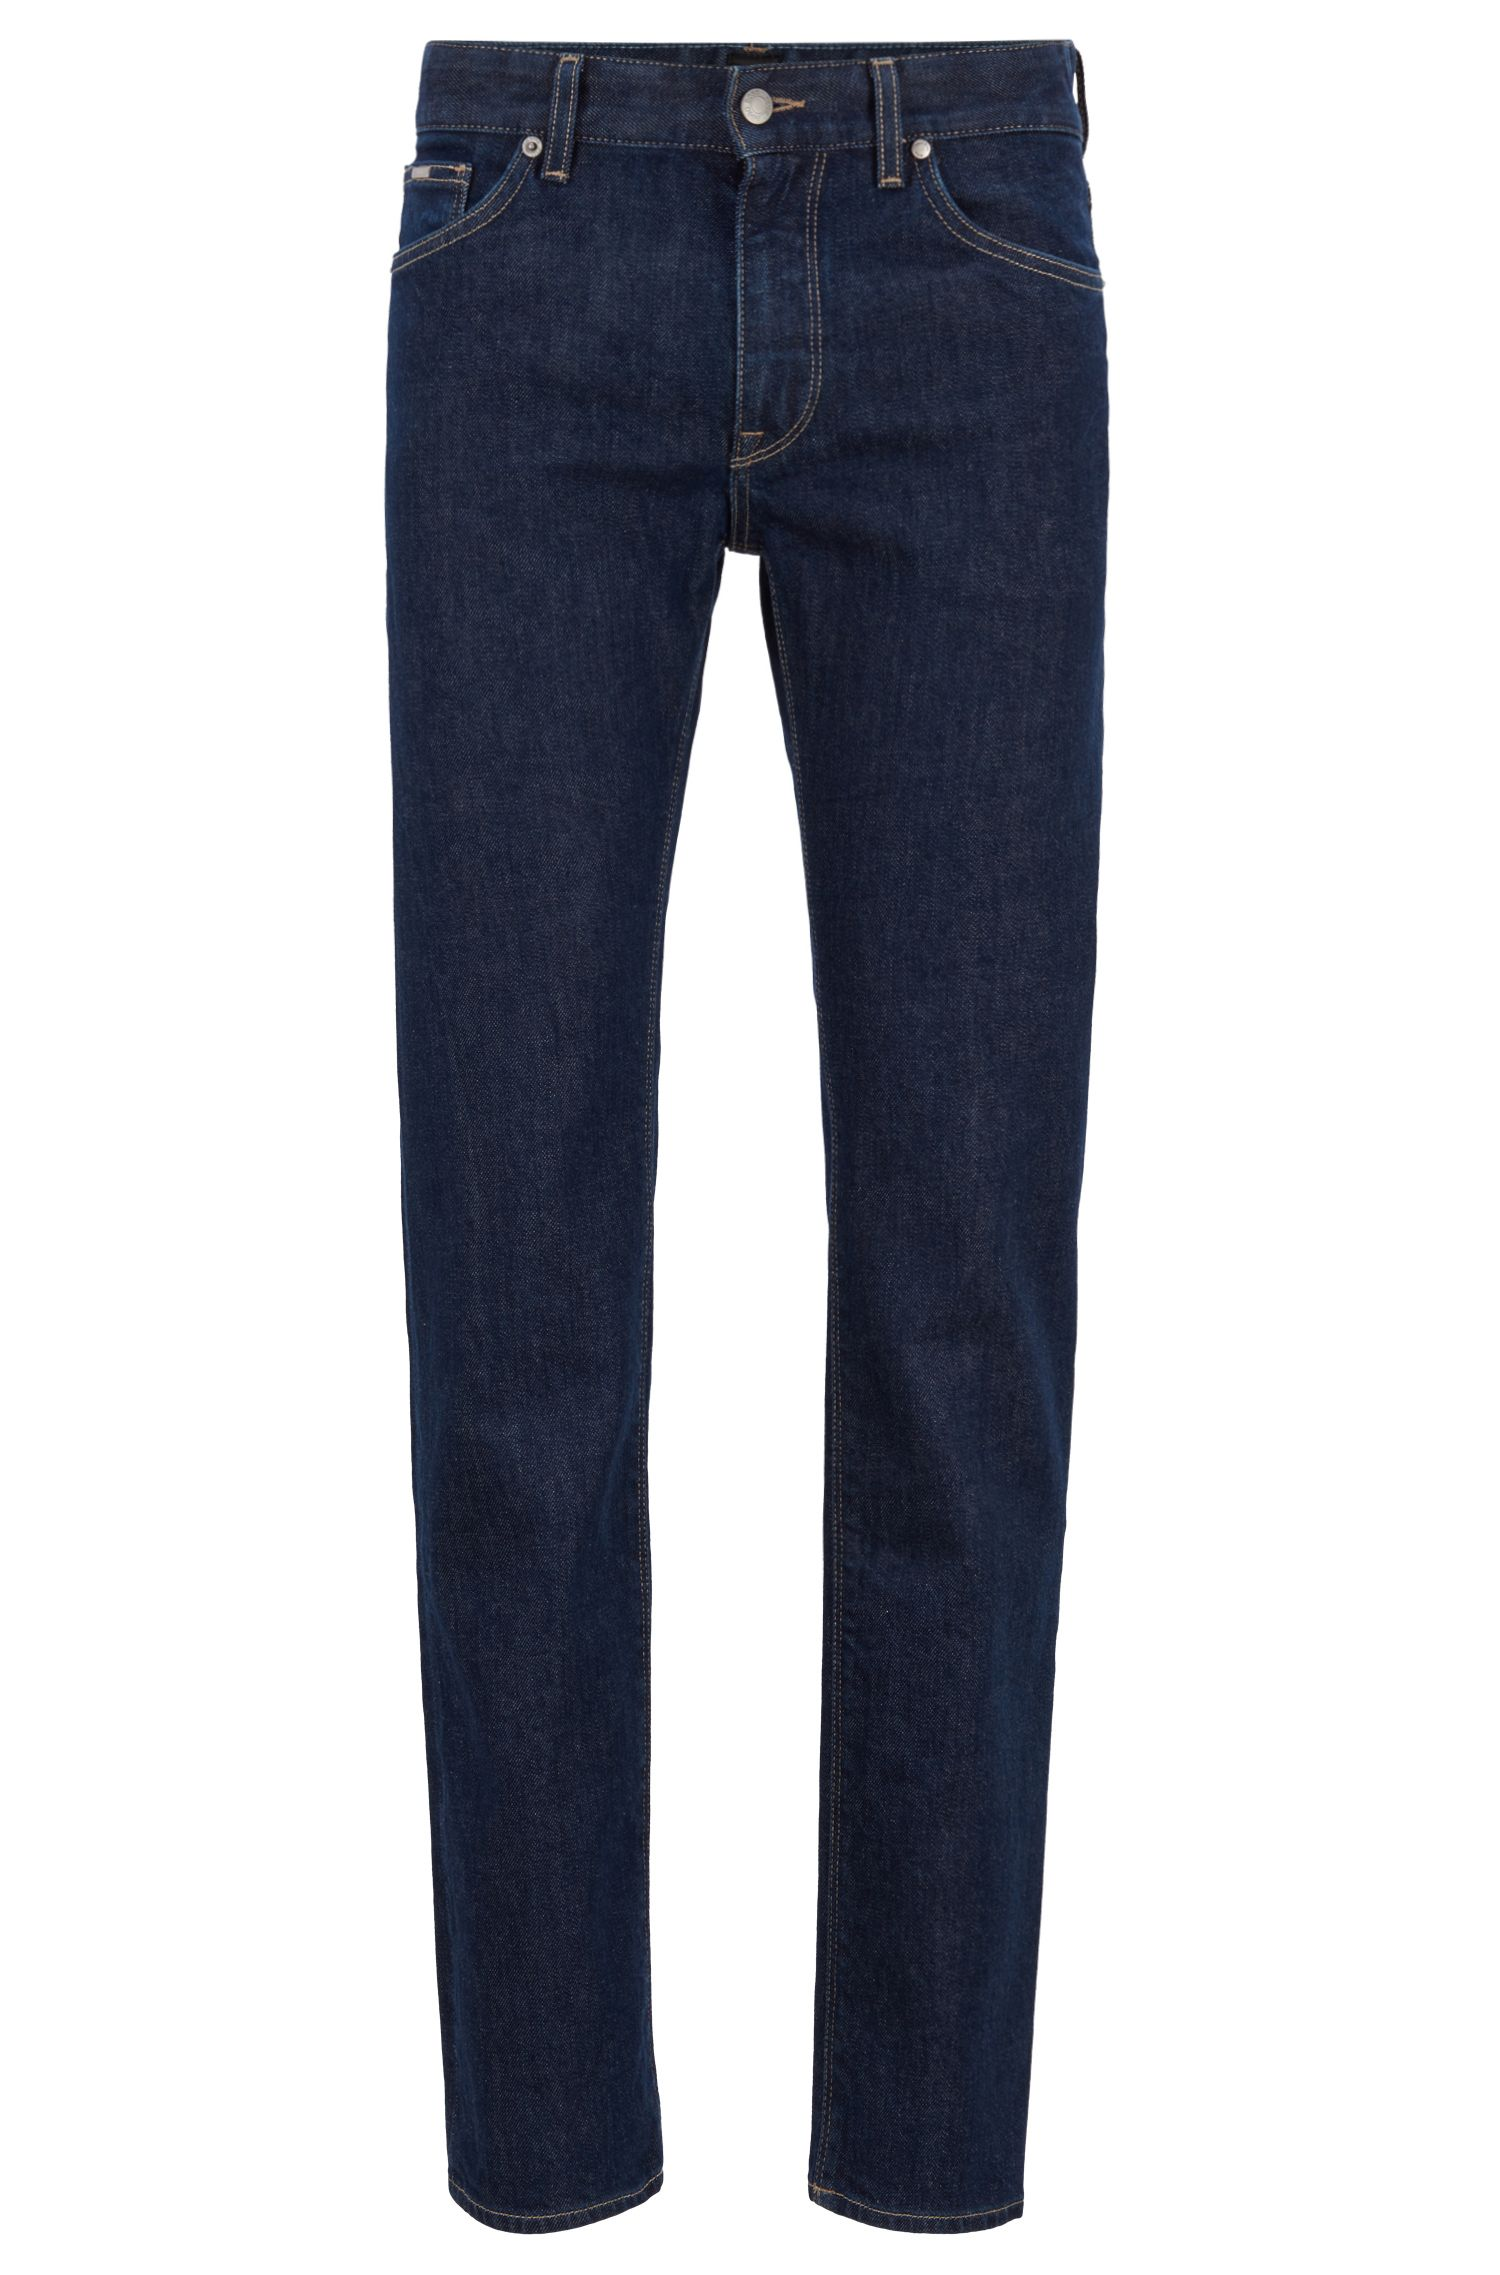 Regular-fit jeans in Italian stretch denim, Dark Blue